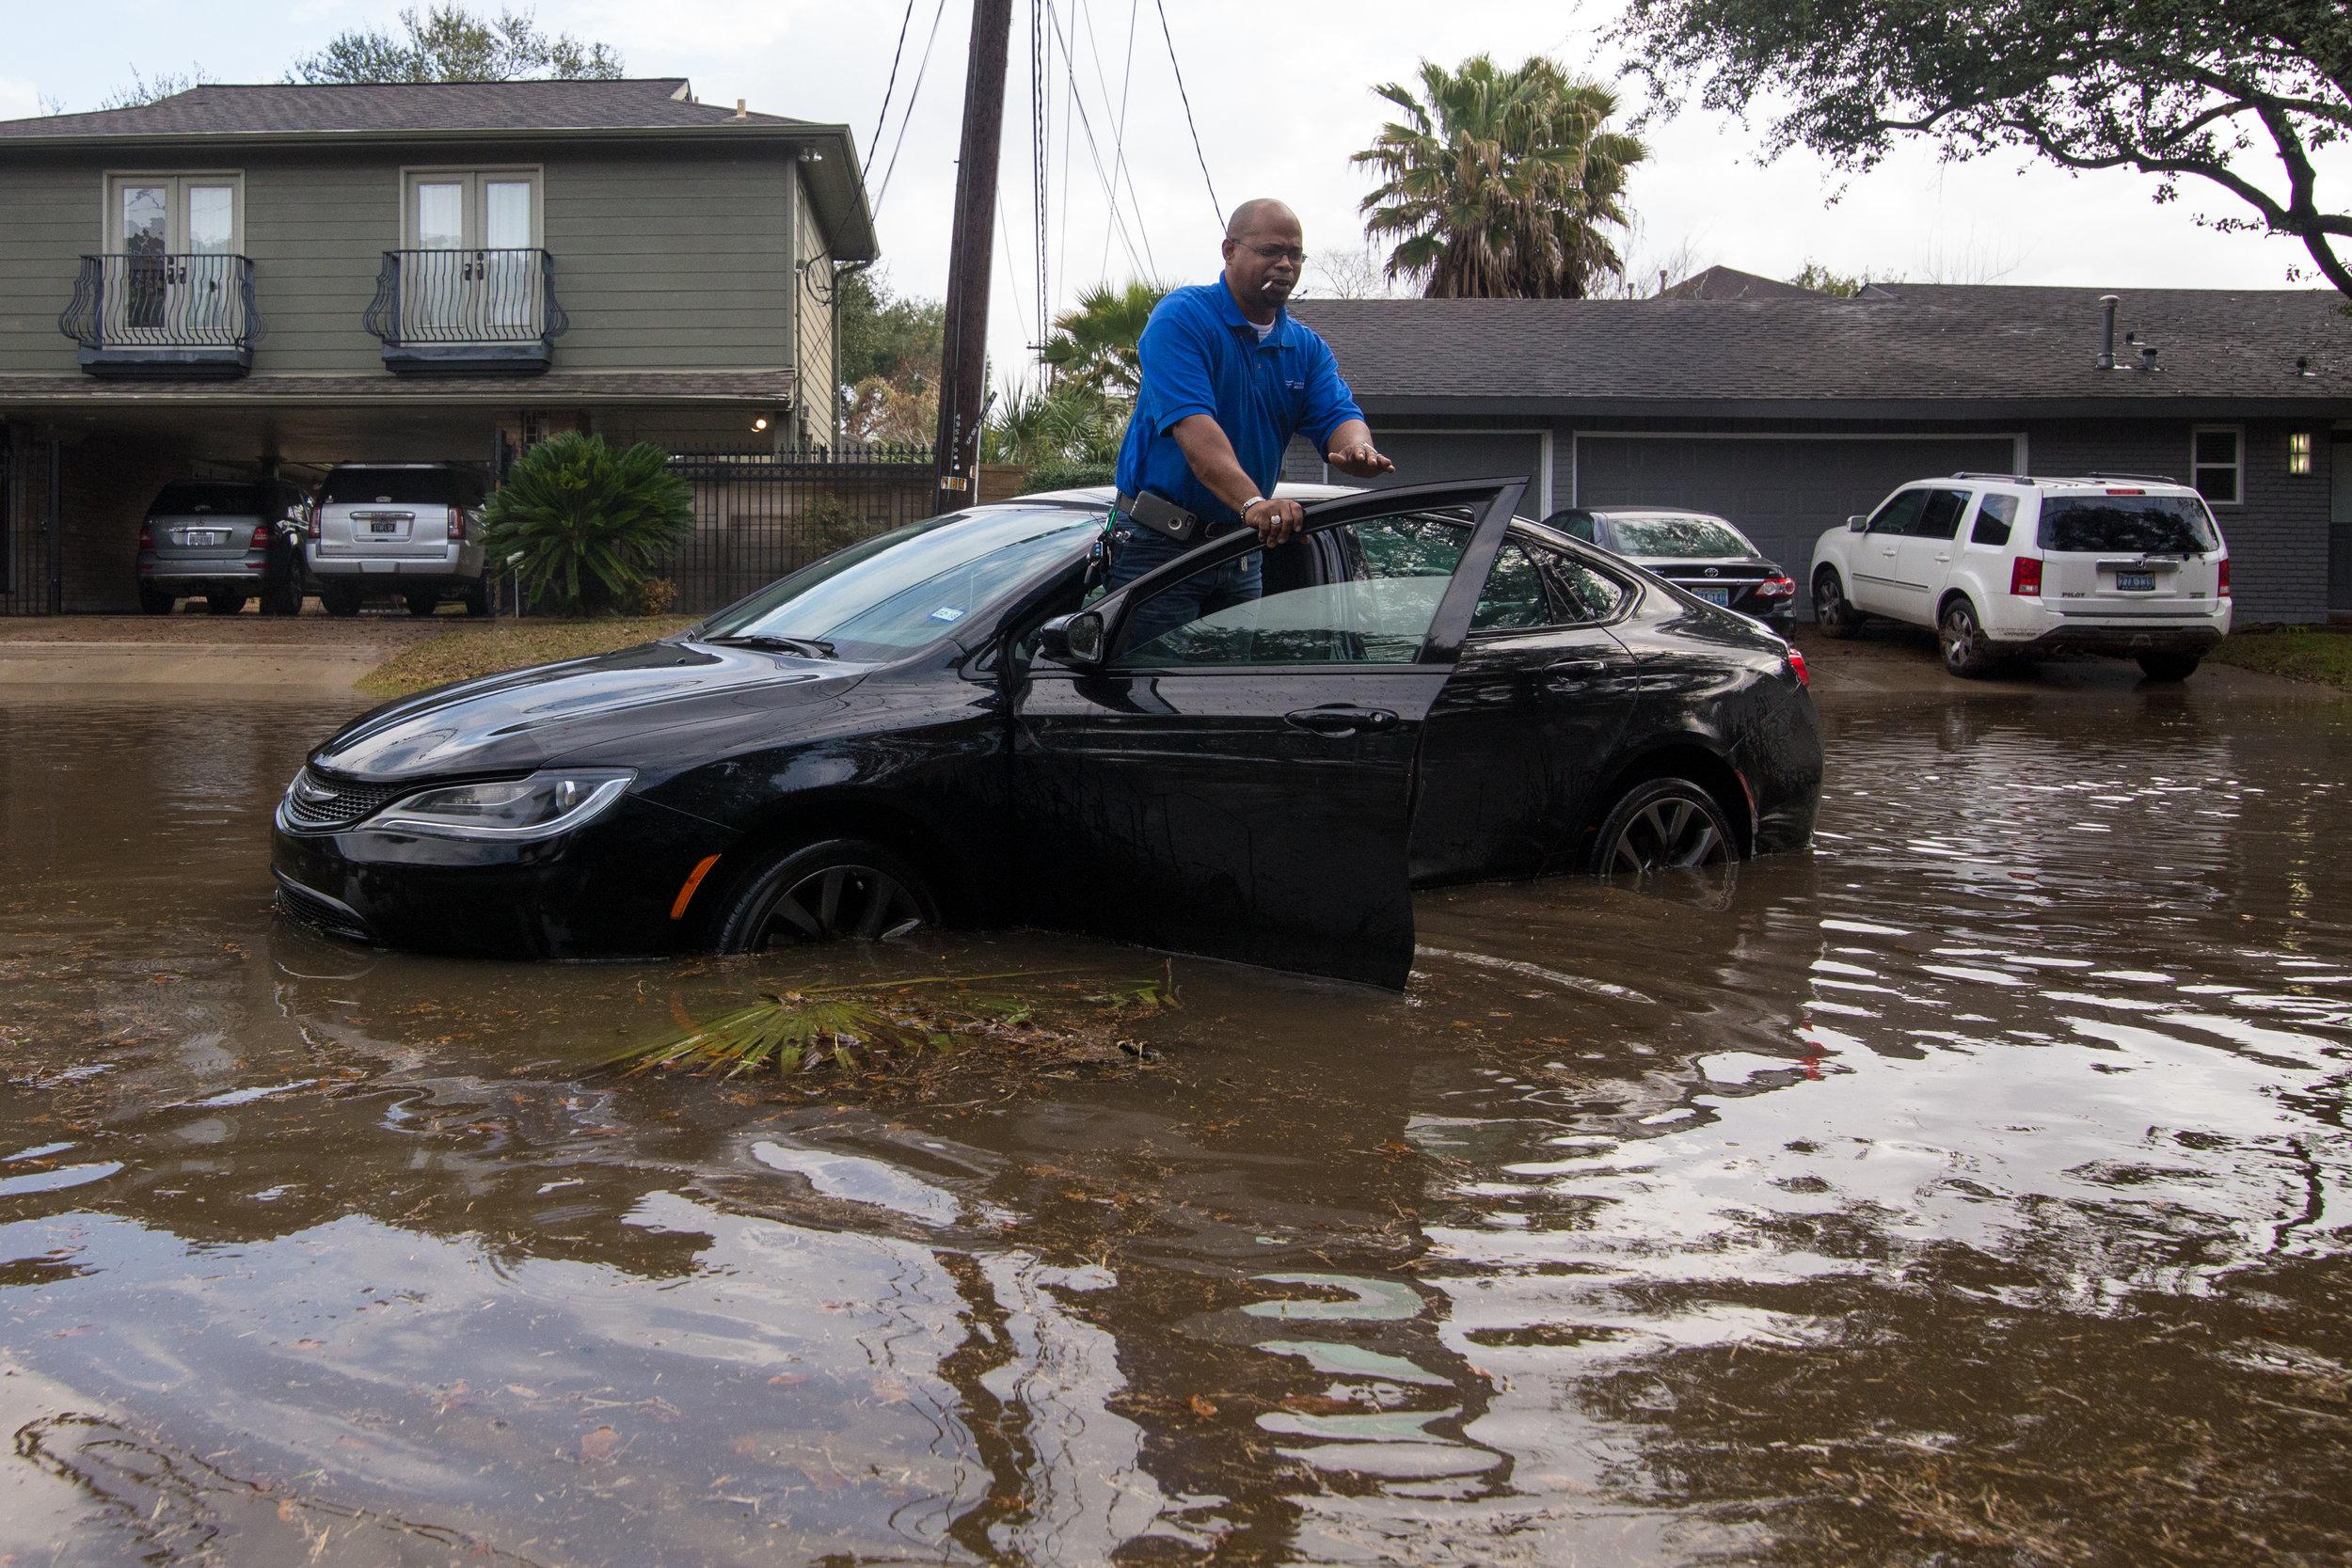 2017-01-18_Houston_Floods_Pu.Ying.Huang0156.jpg